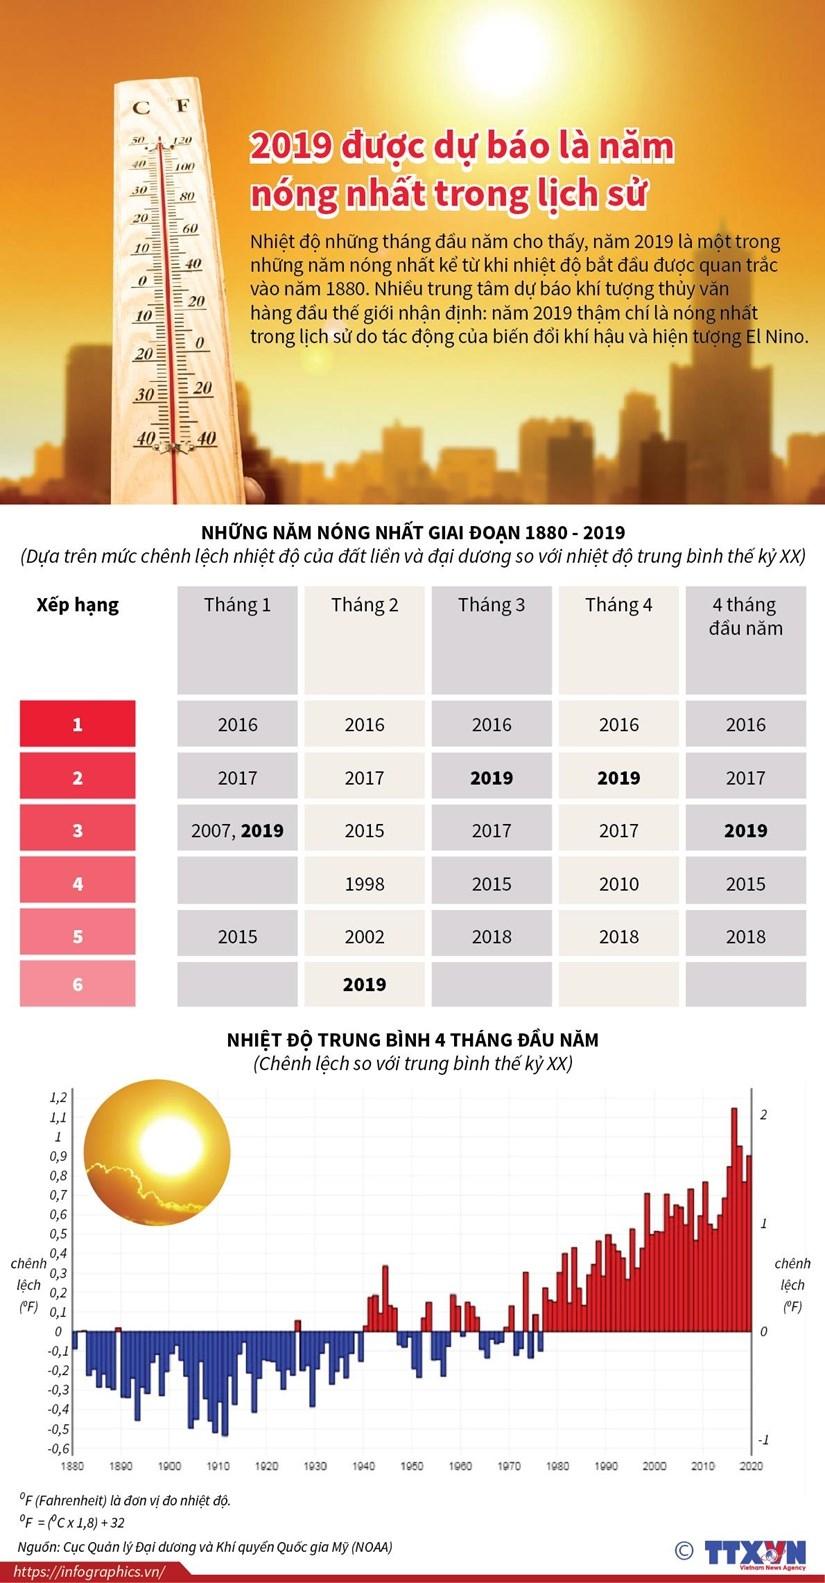 infographics 2019 duoc du bao la nam nong nhat trong lich su